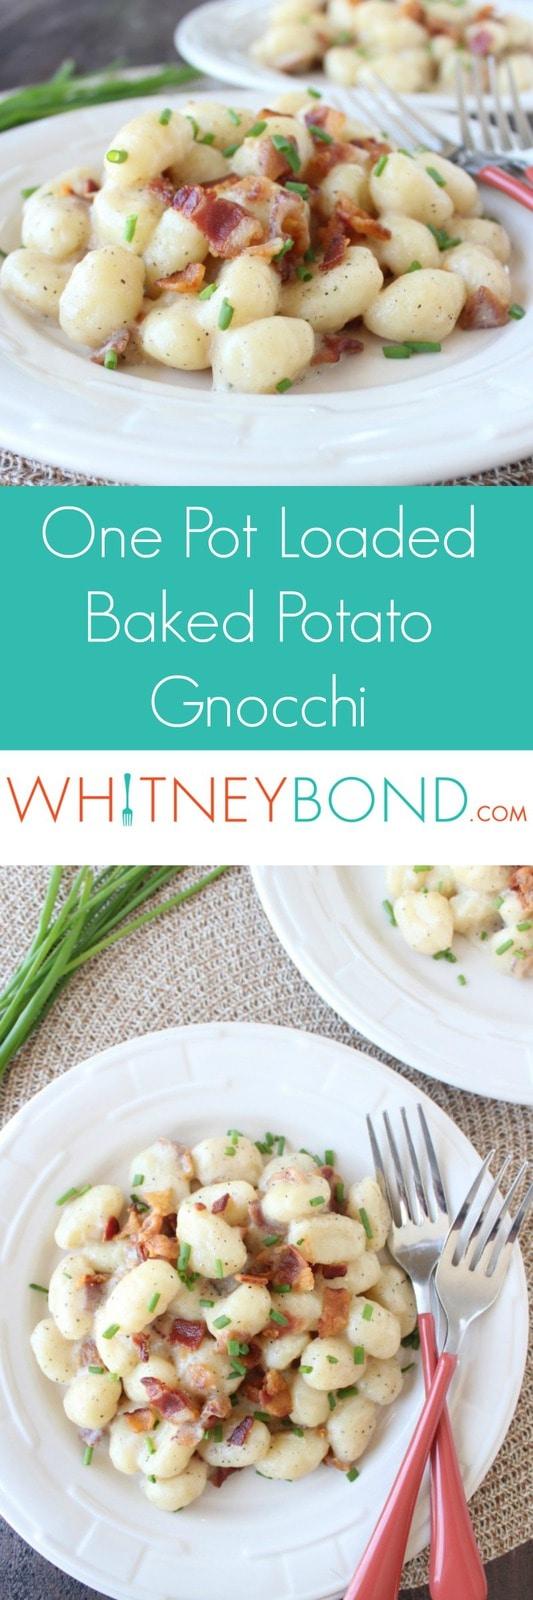 One Pot Loaded Baked Potato Gnocchi Recipe